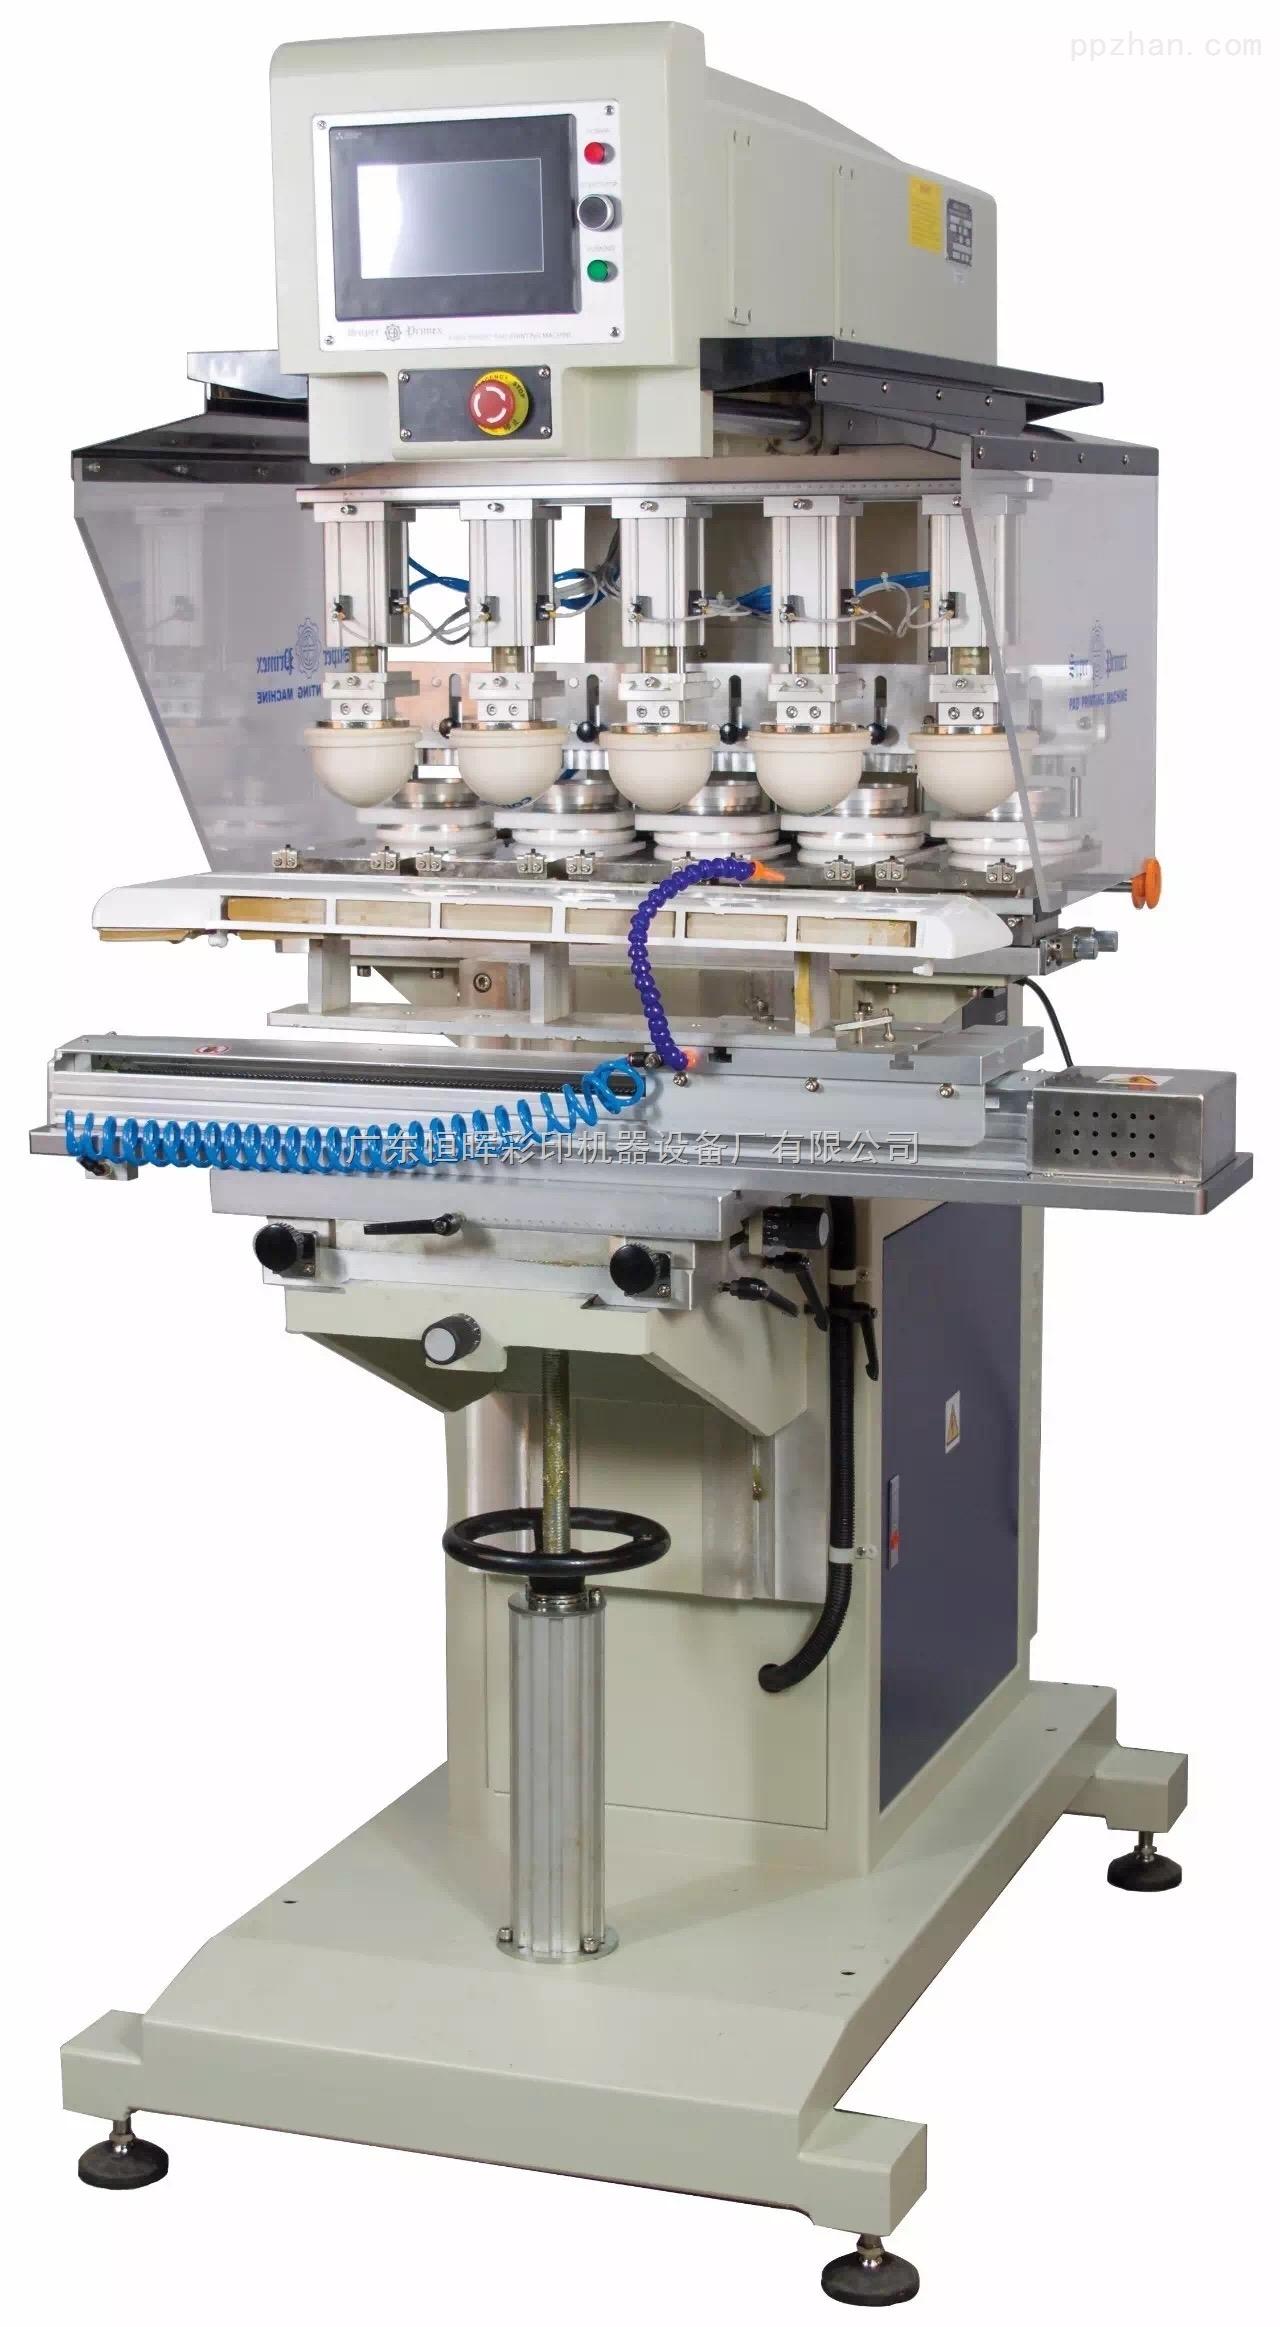 SPCST-8510SDQ1-独立印头伺服穿梭五色挂式油盅移印机(PLC)